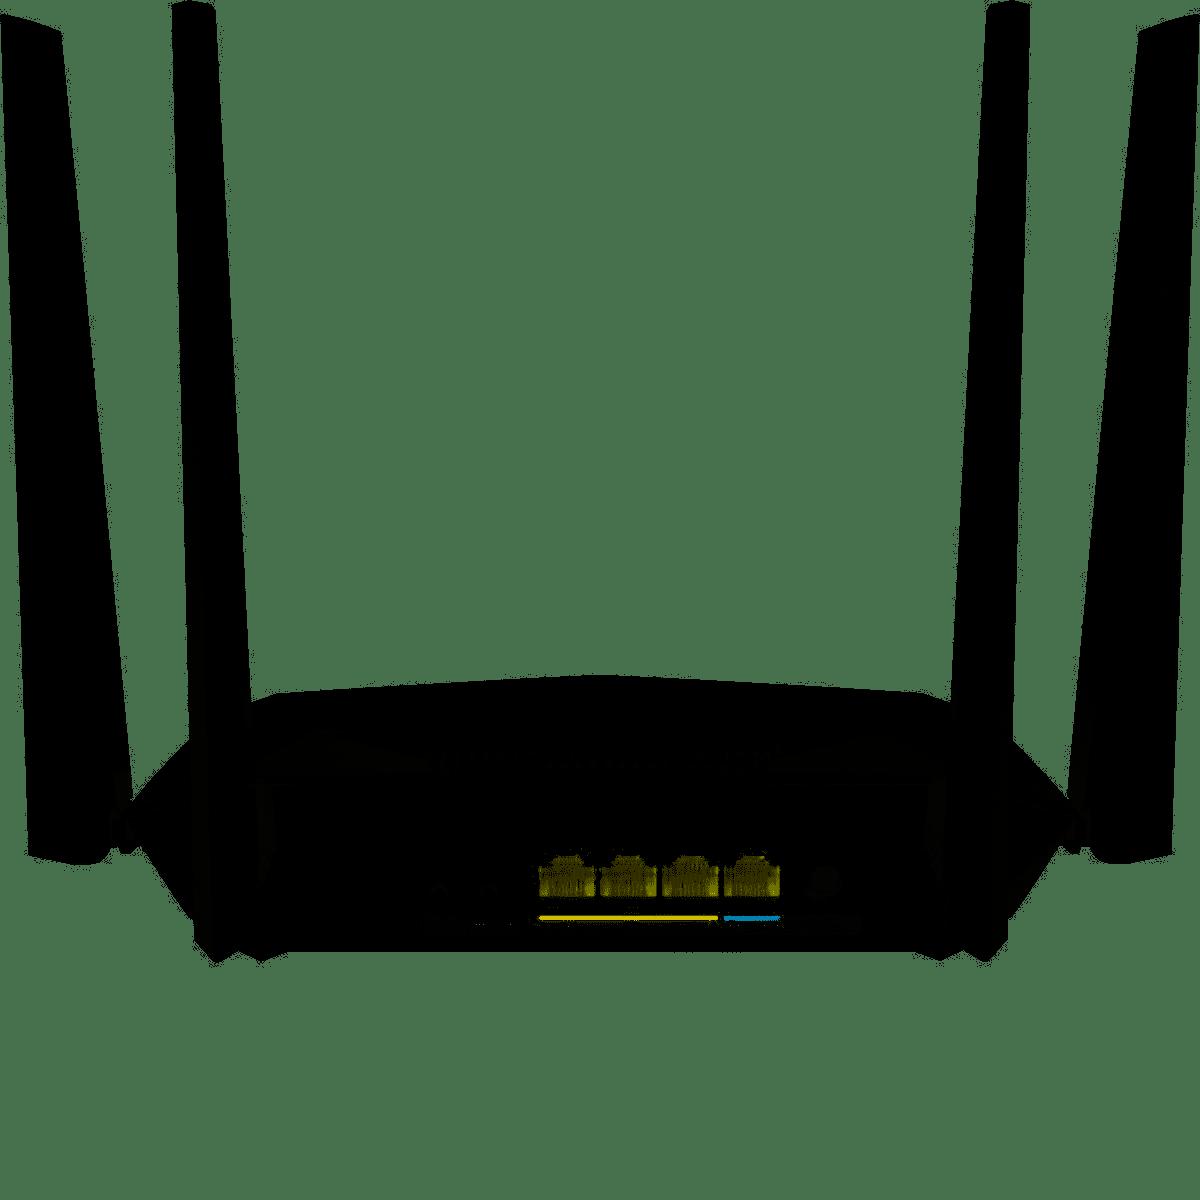 Roteador Intelbras RG 1200 Gigabit Action  - CFTV Clube   Brasil